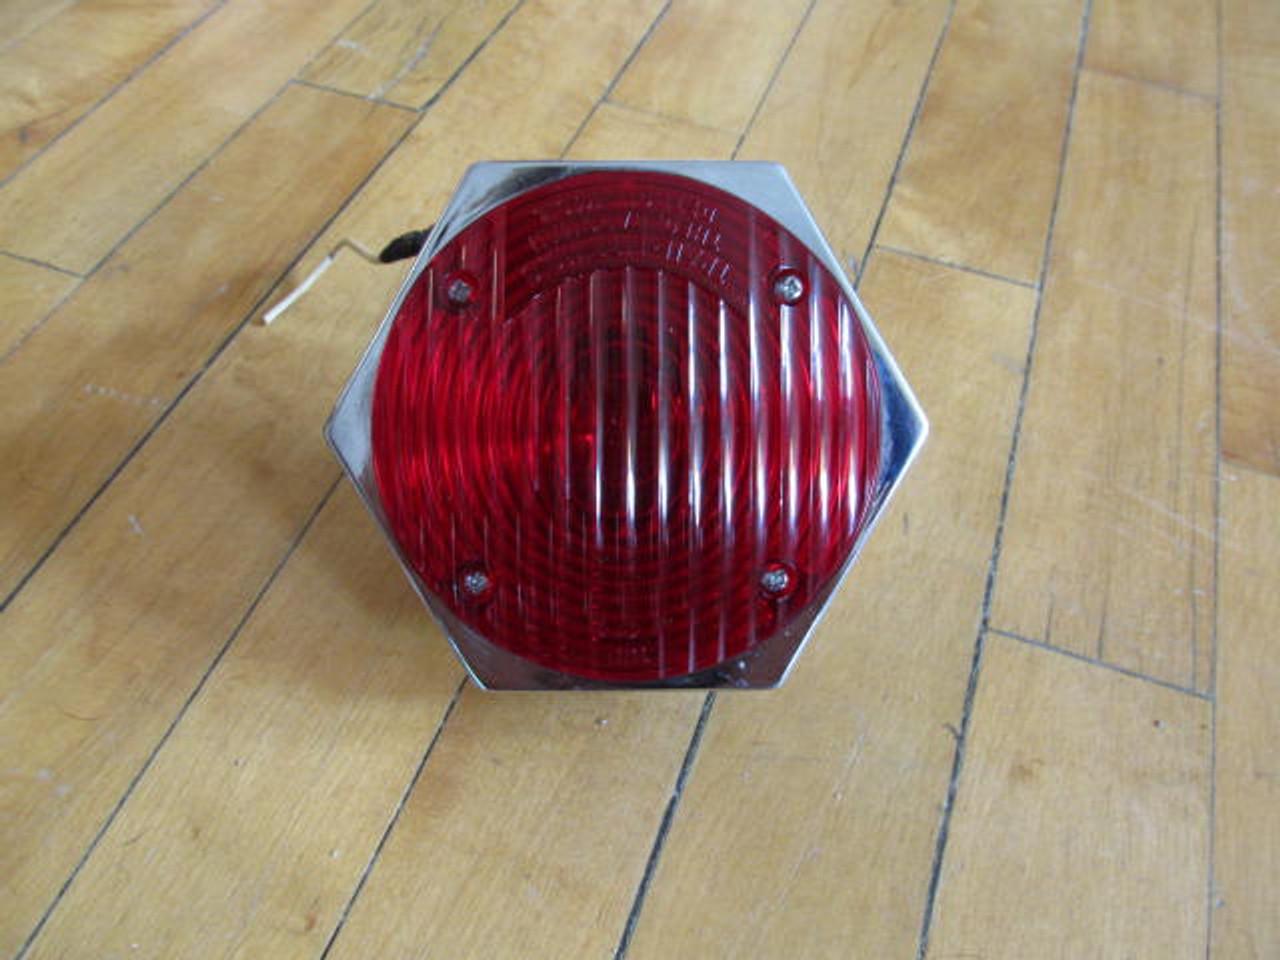 Bargman Trail-Lite No. 6 Stop-Tail-Turn Light (LT347)